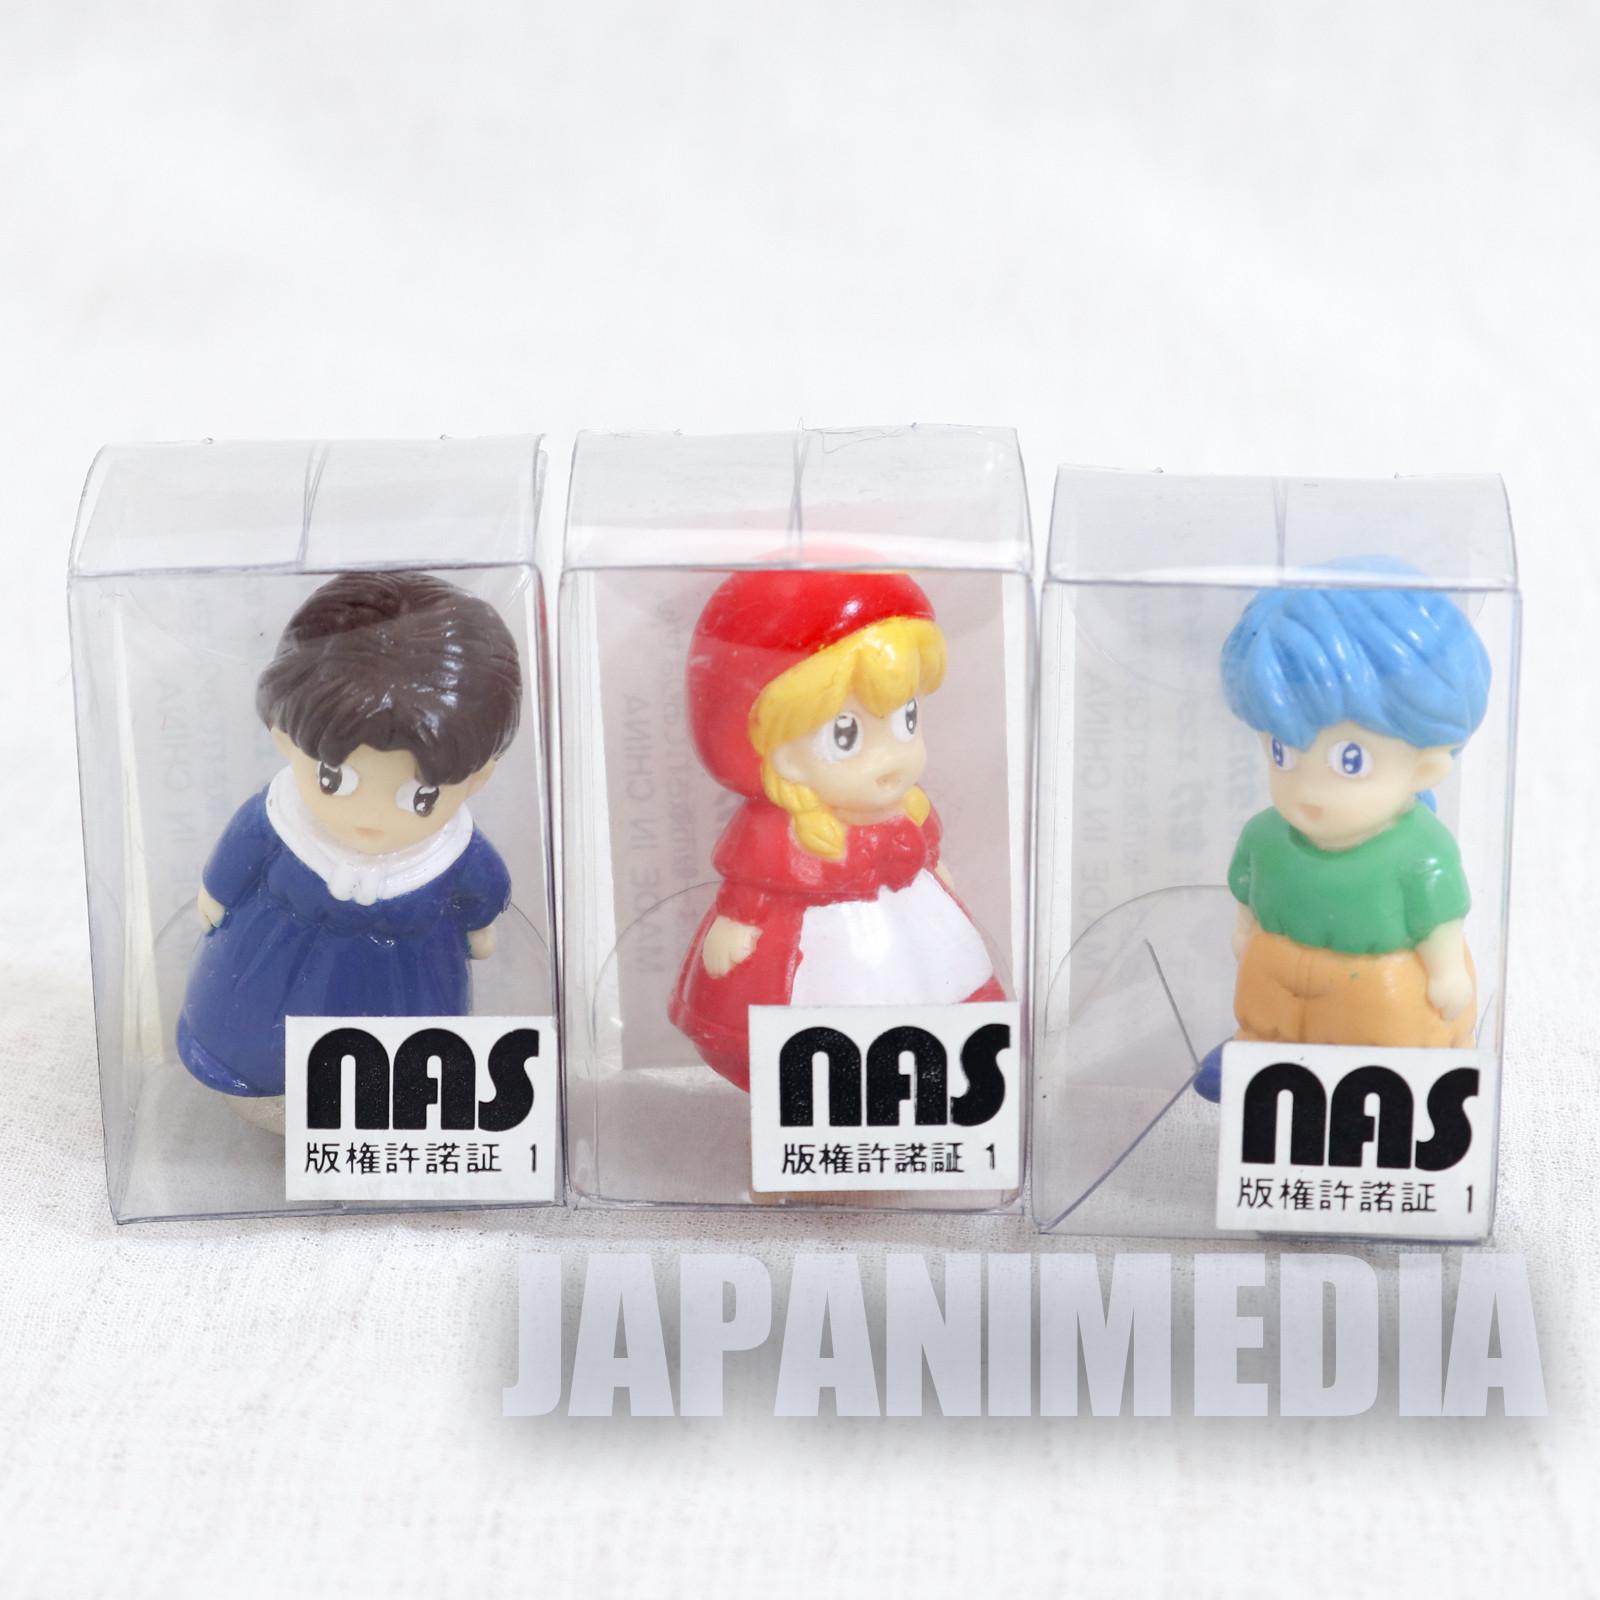 Akazukin Chacha Shiine Riiya Mini Figure with Sucker Set JAPAN ANIME